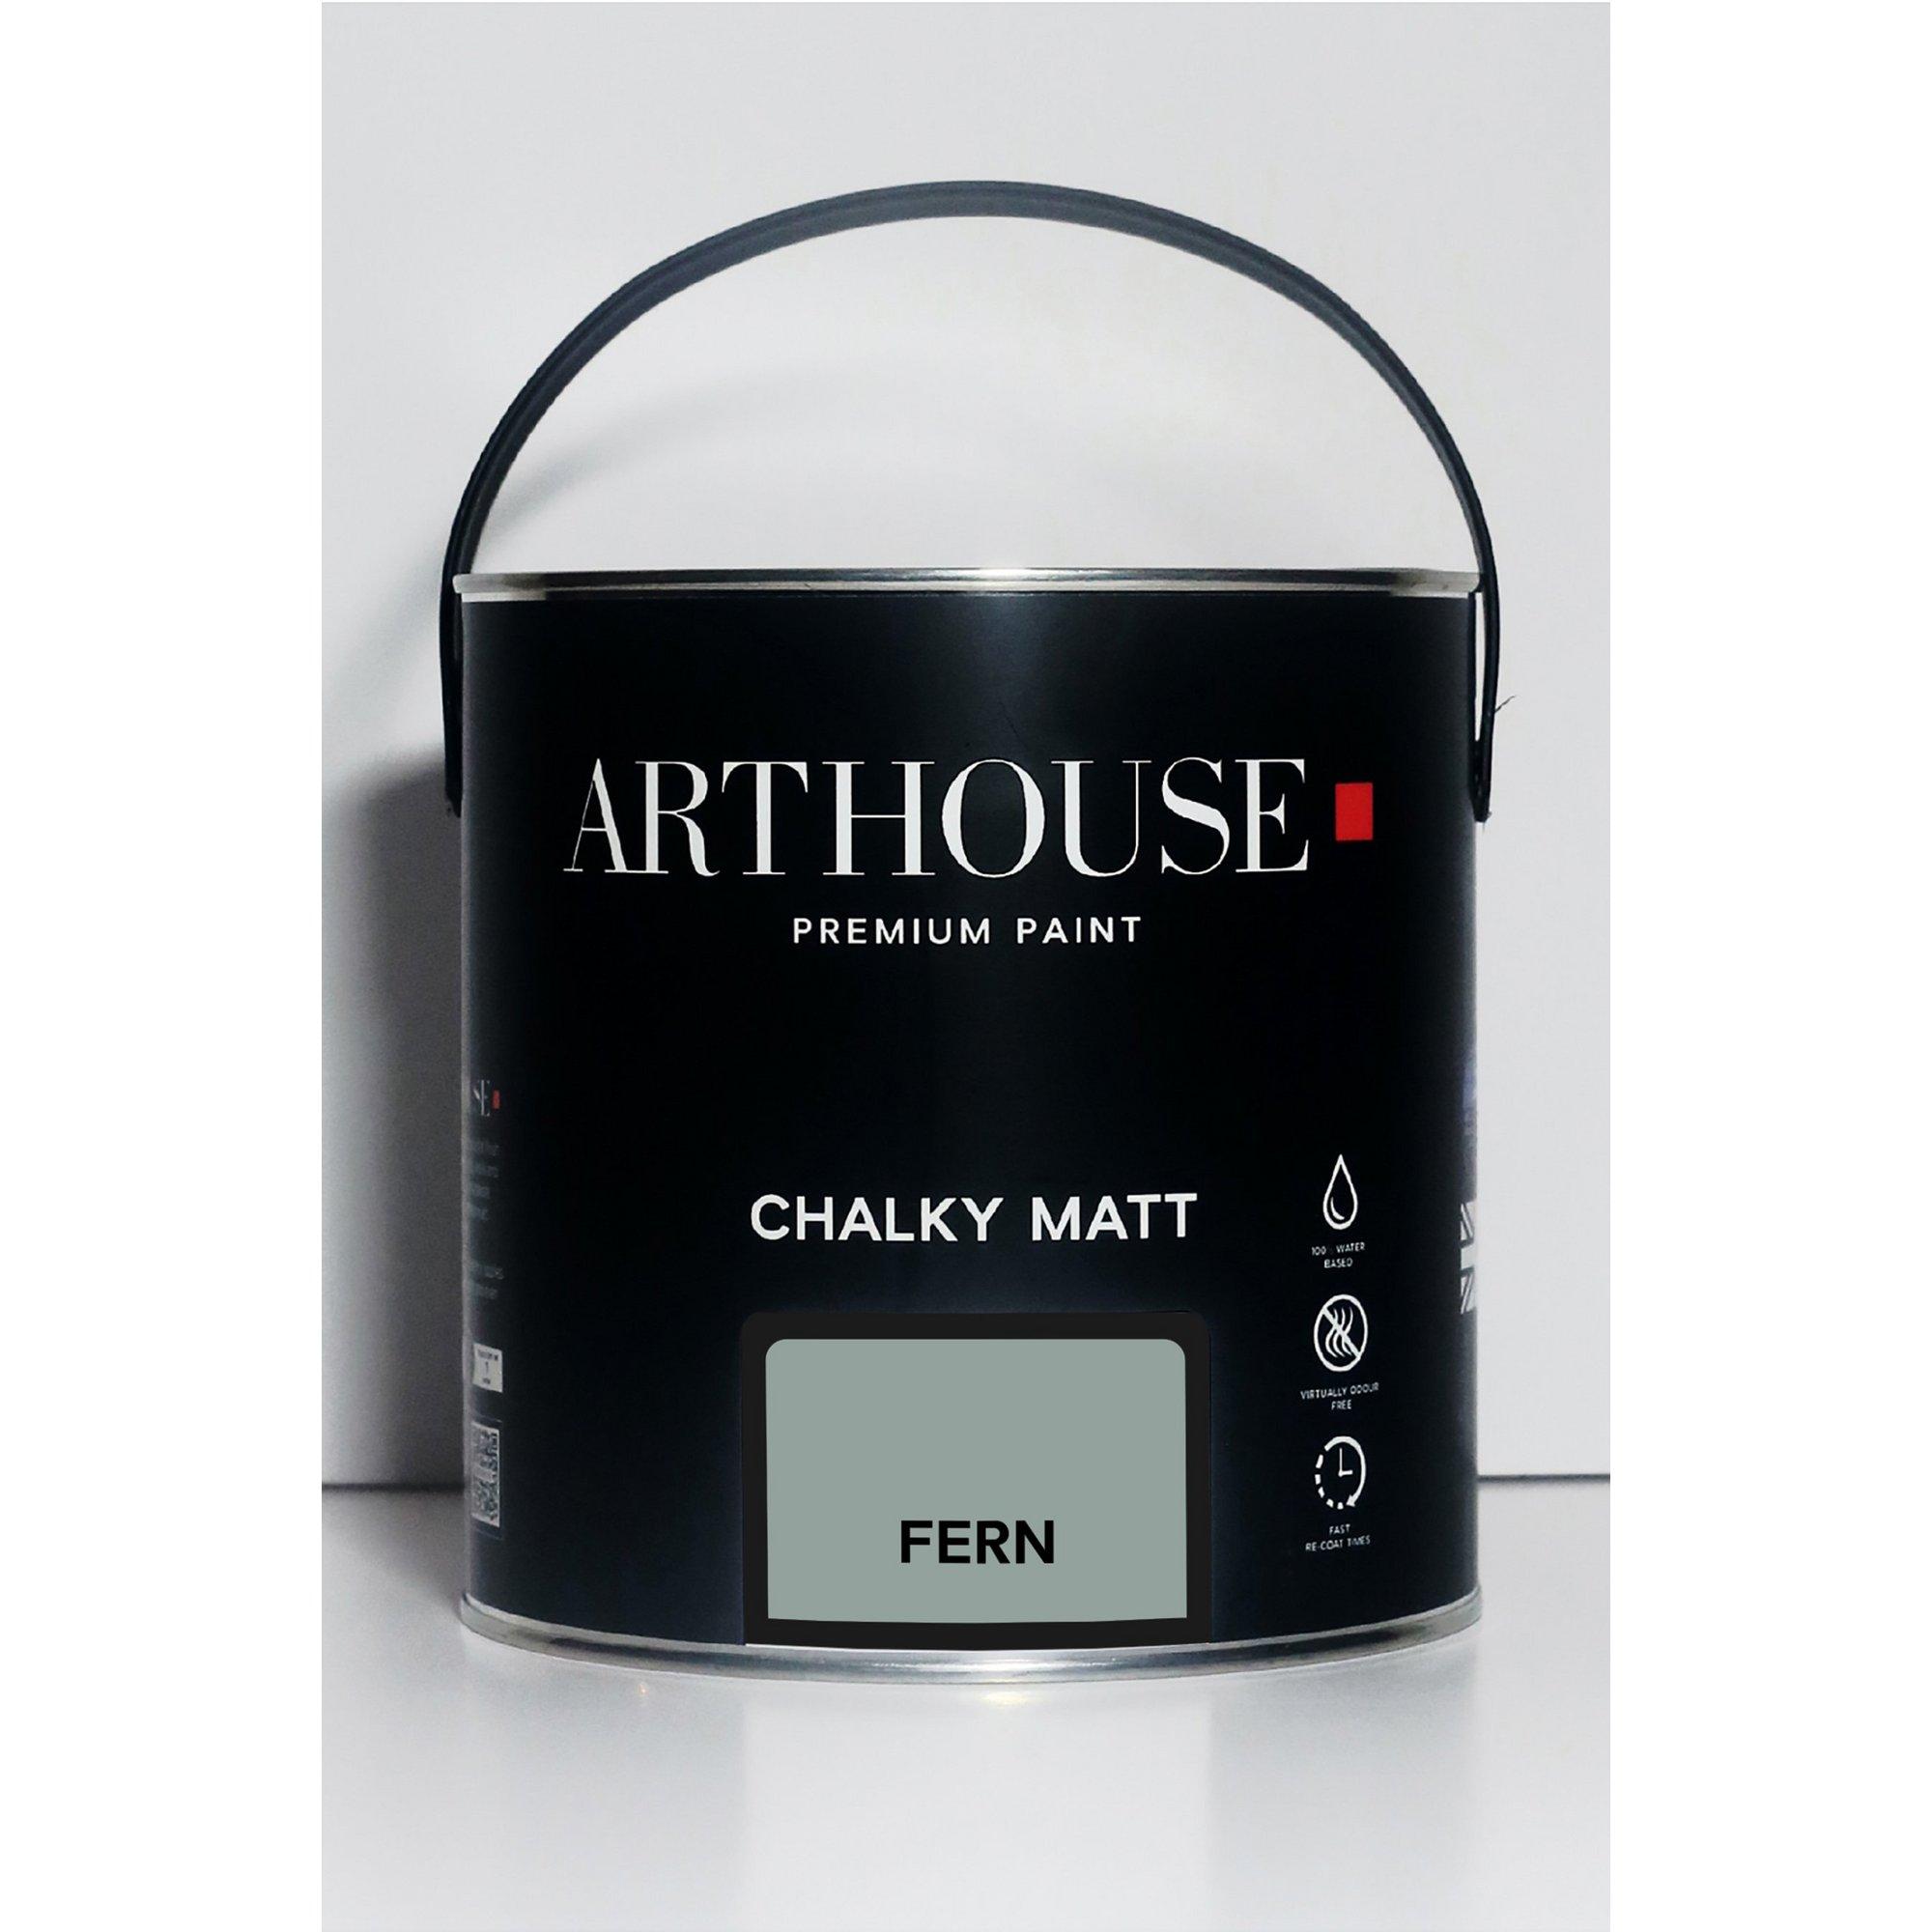 Image of Chalky Matt Fern Emulsion Paint